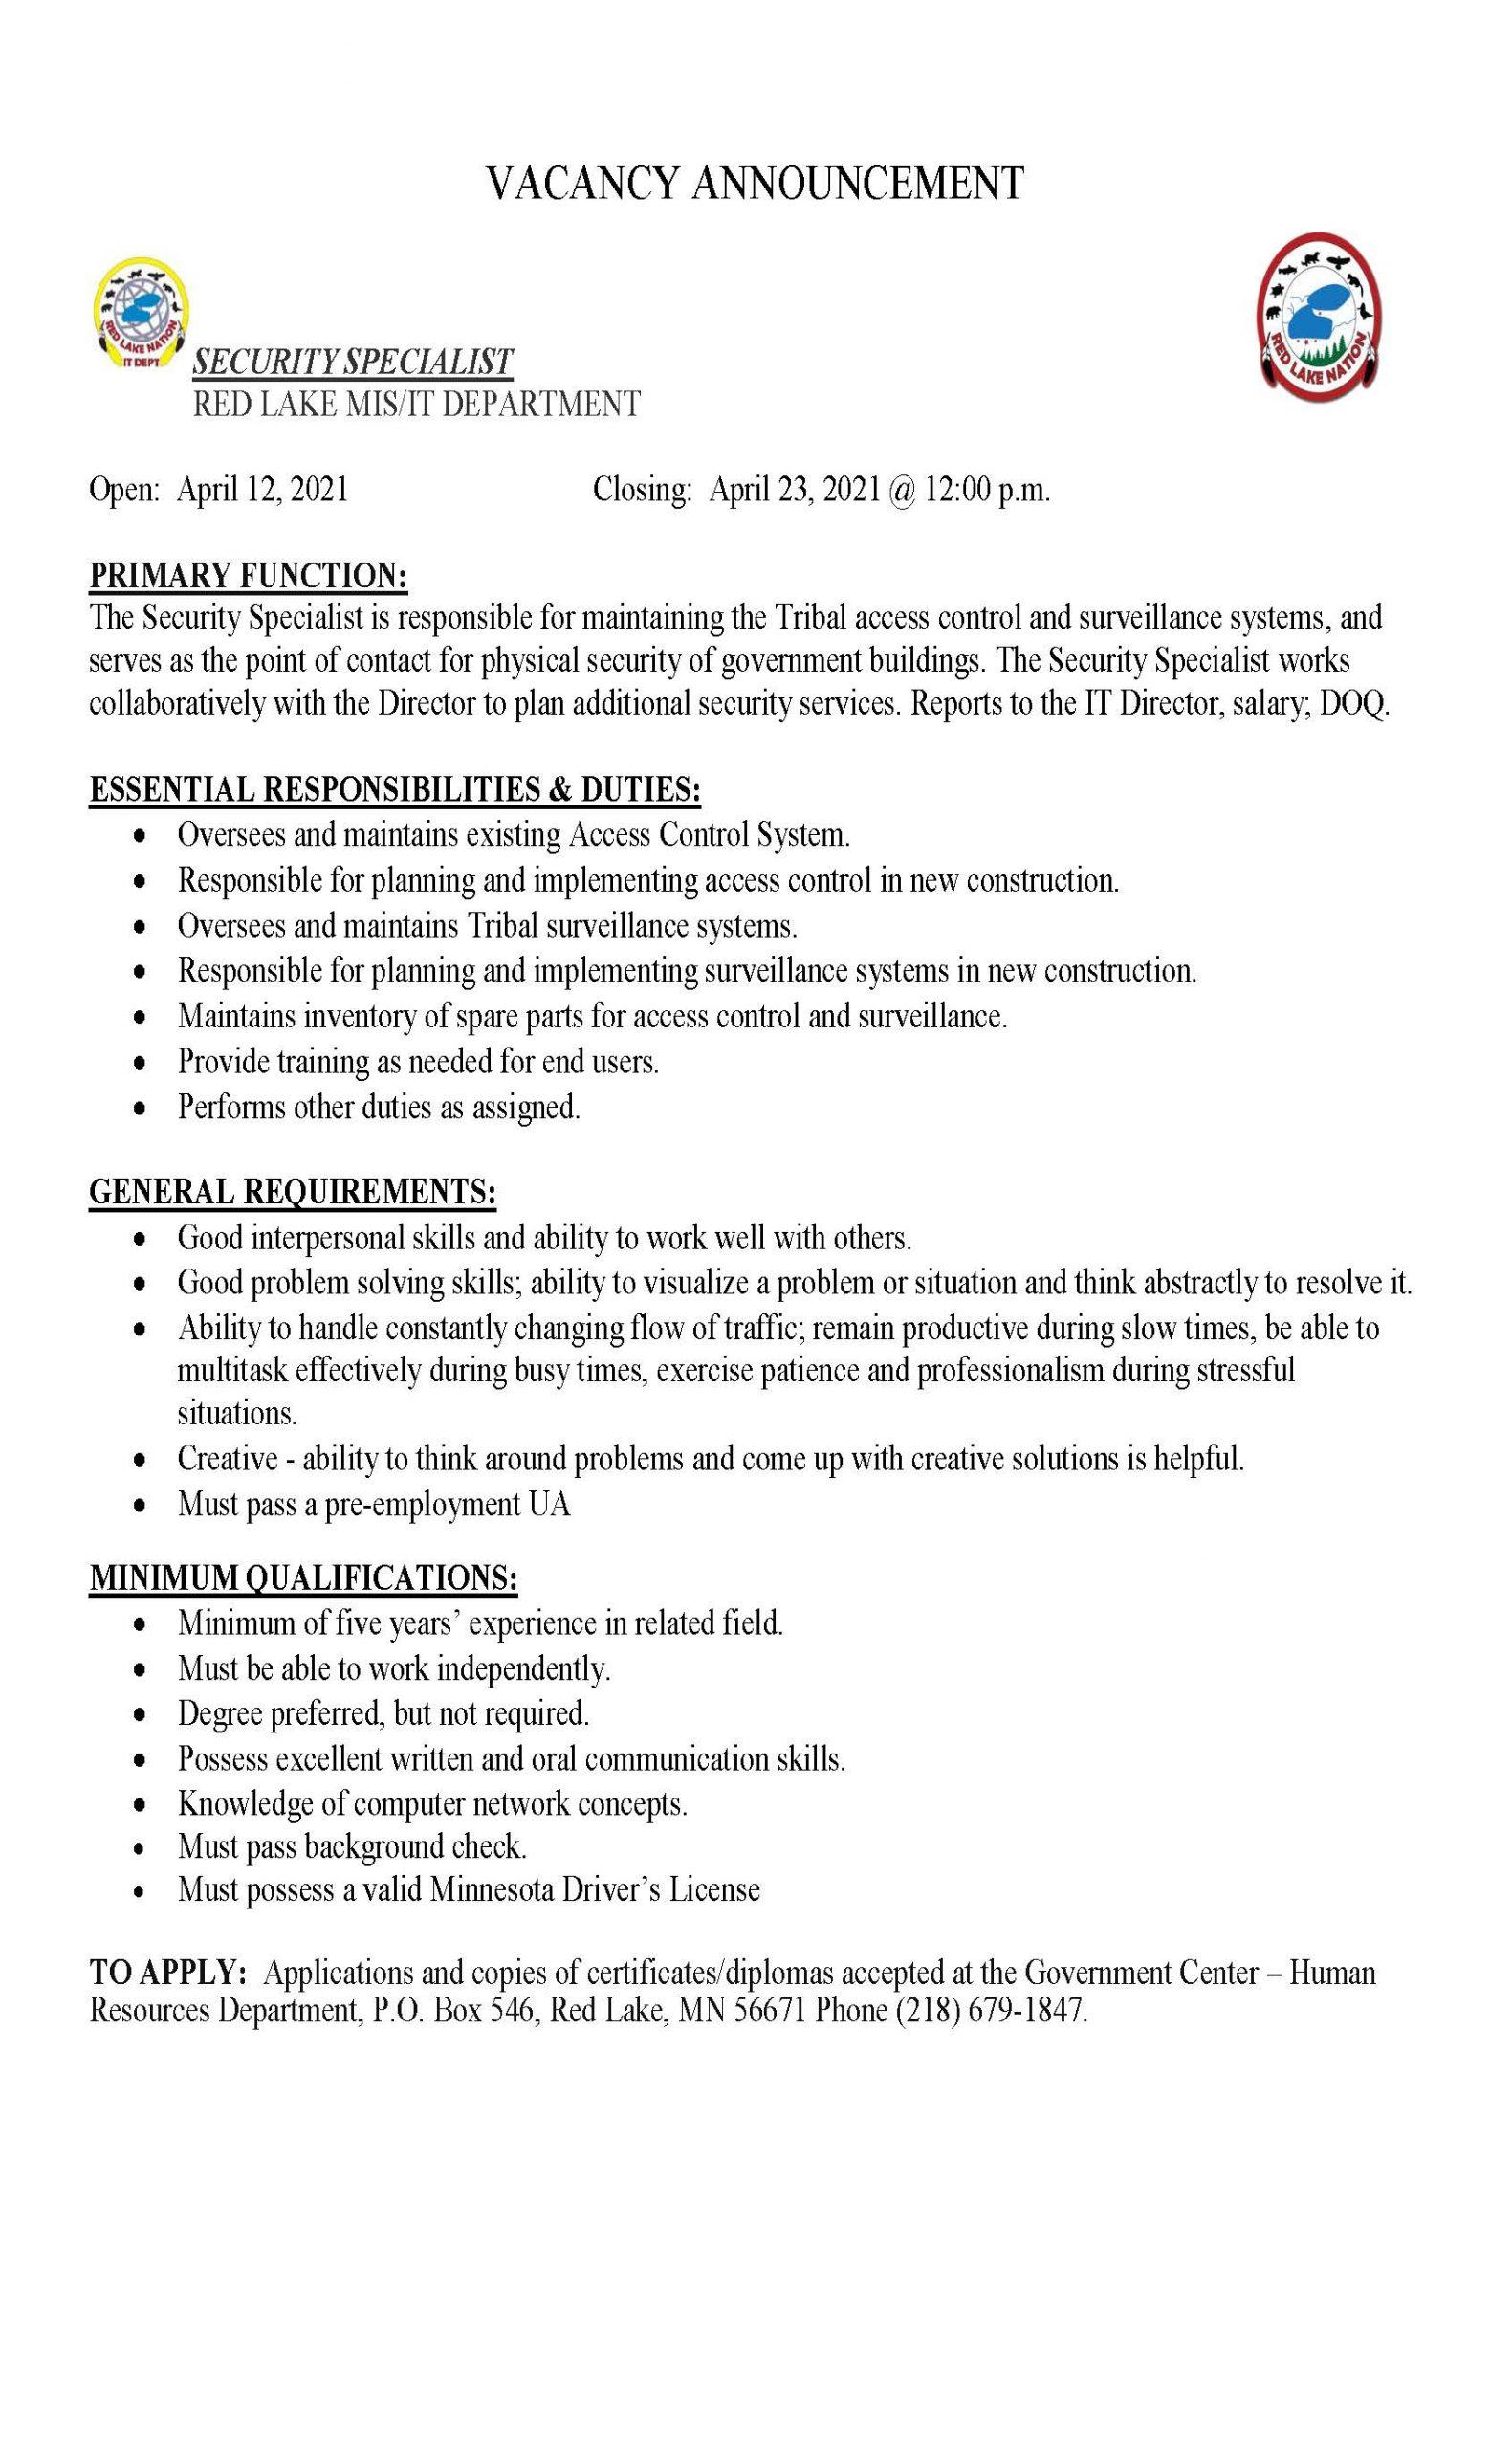 Security Specialist-MIS IT Department Job Posting-4-12-2021